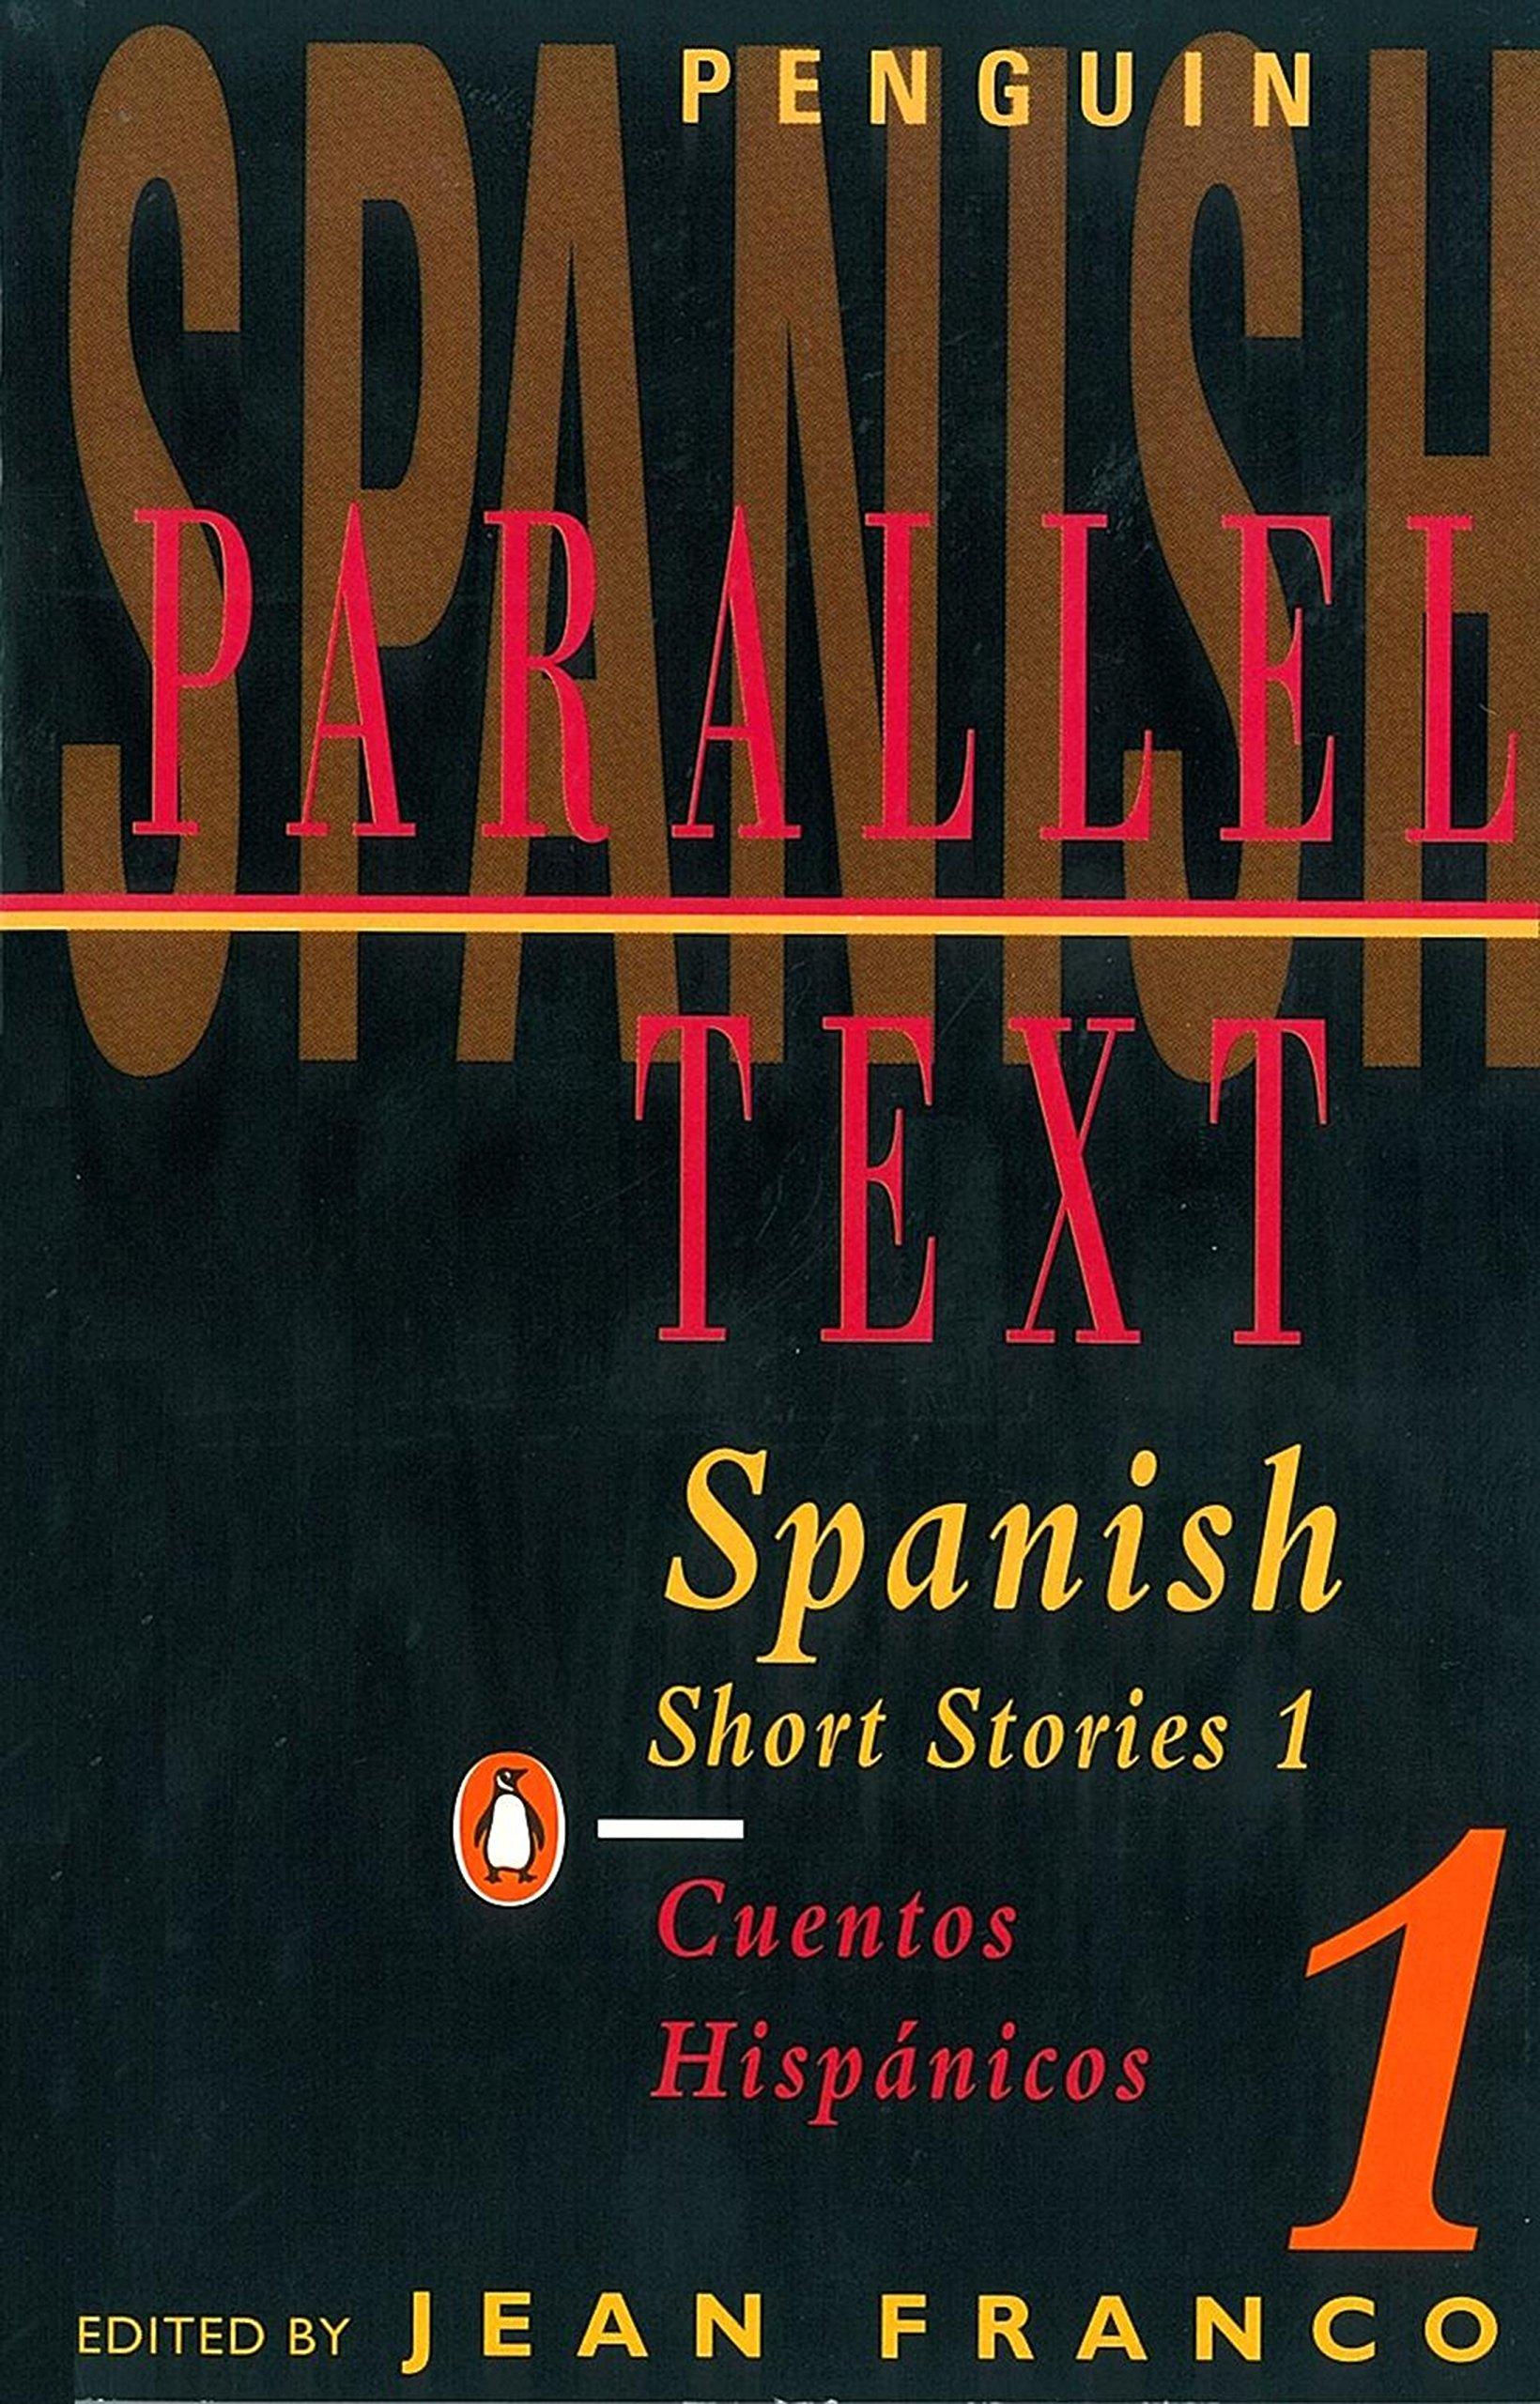 Spanish Short Stories (Penguin Parallel Text)